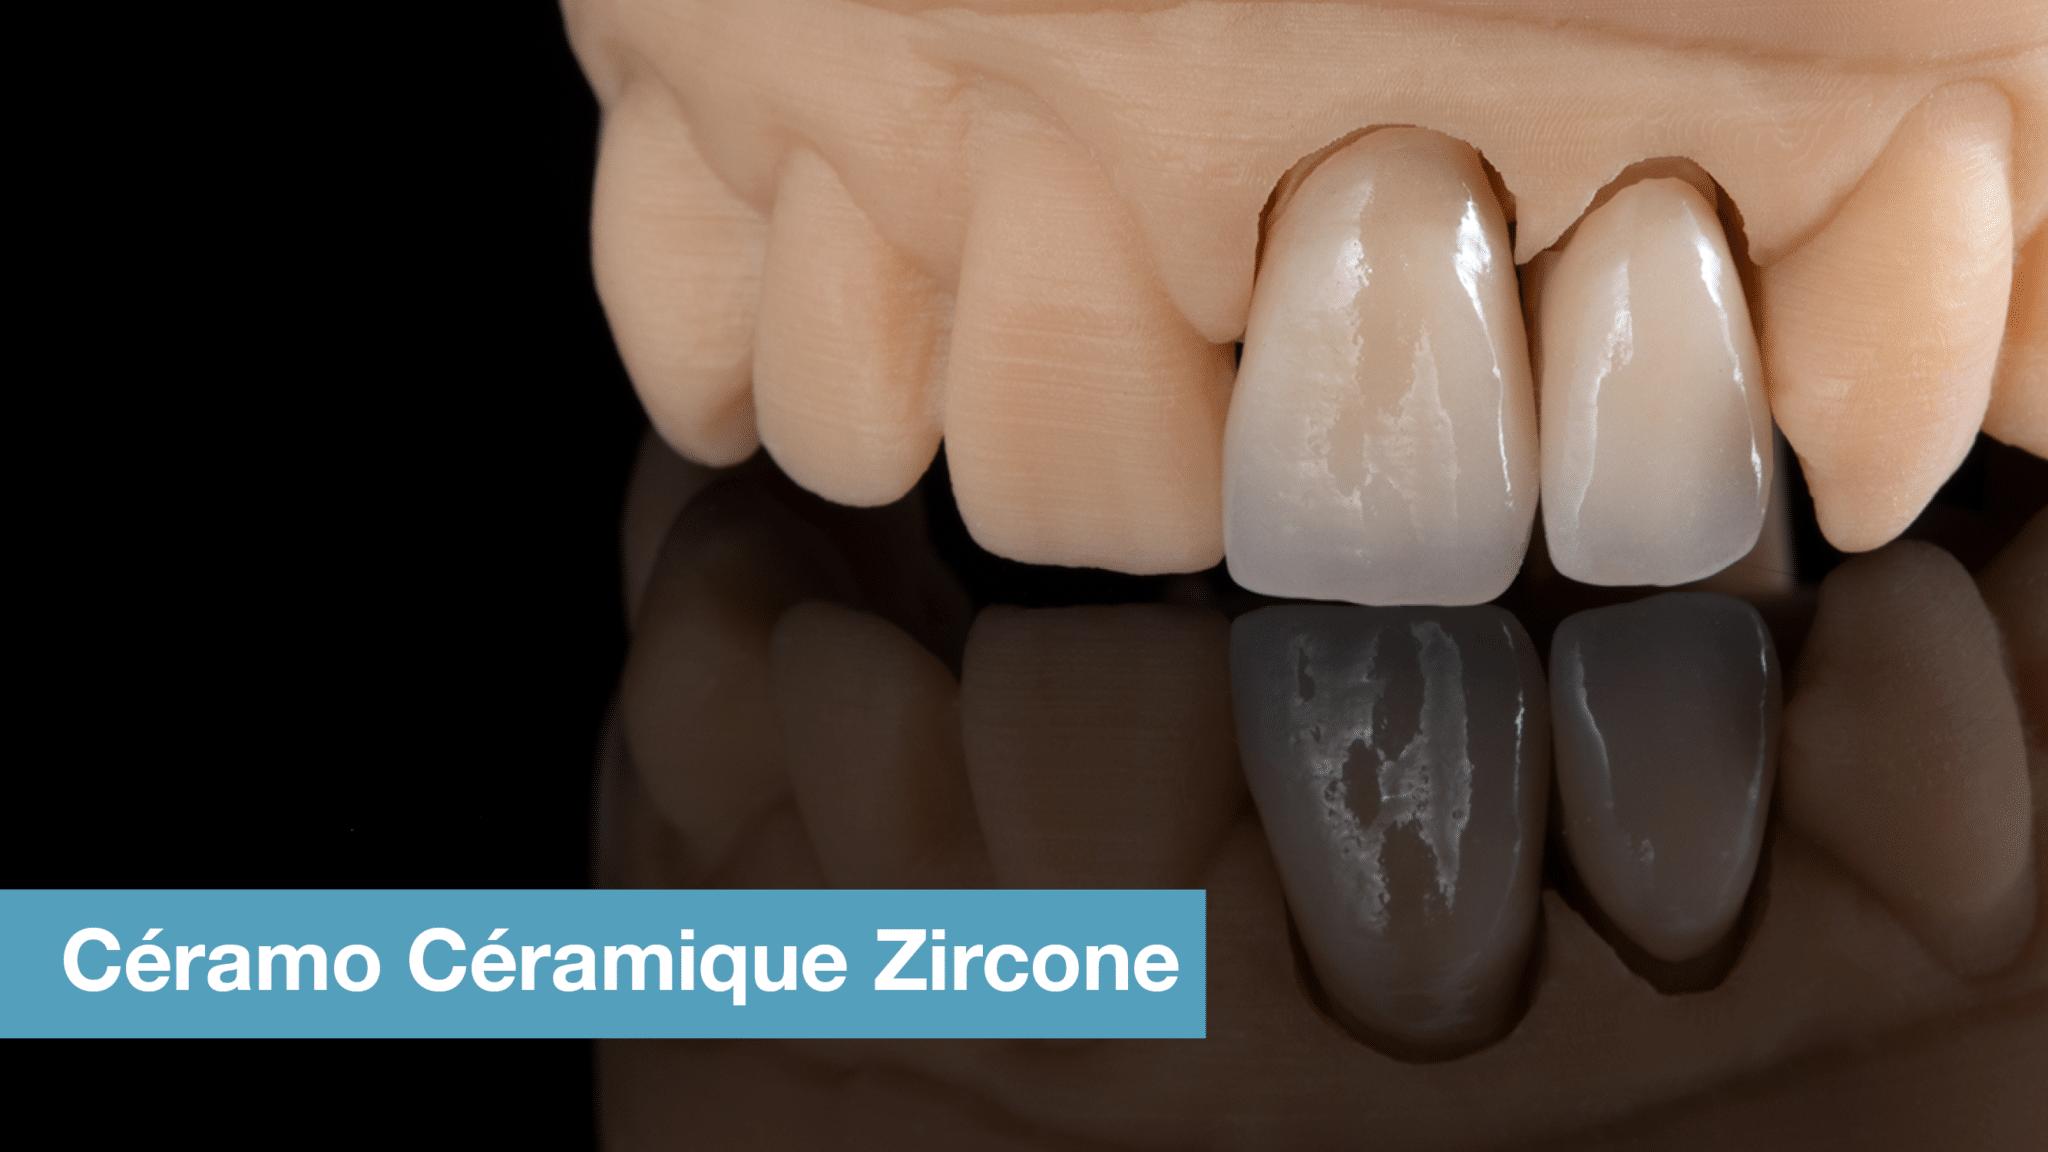 Couronne Ceramo Ceramique Zircone